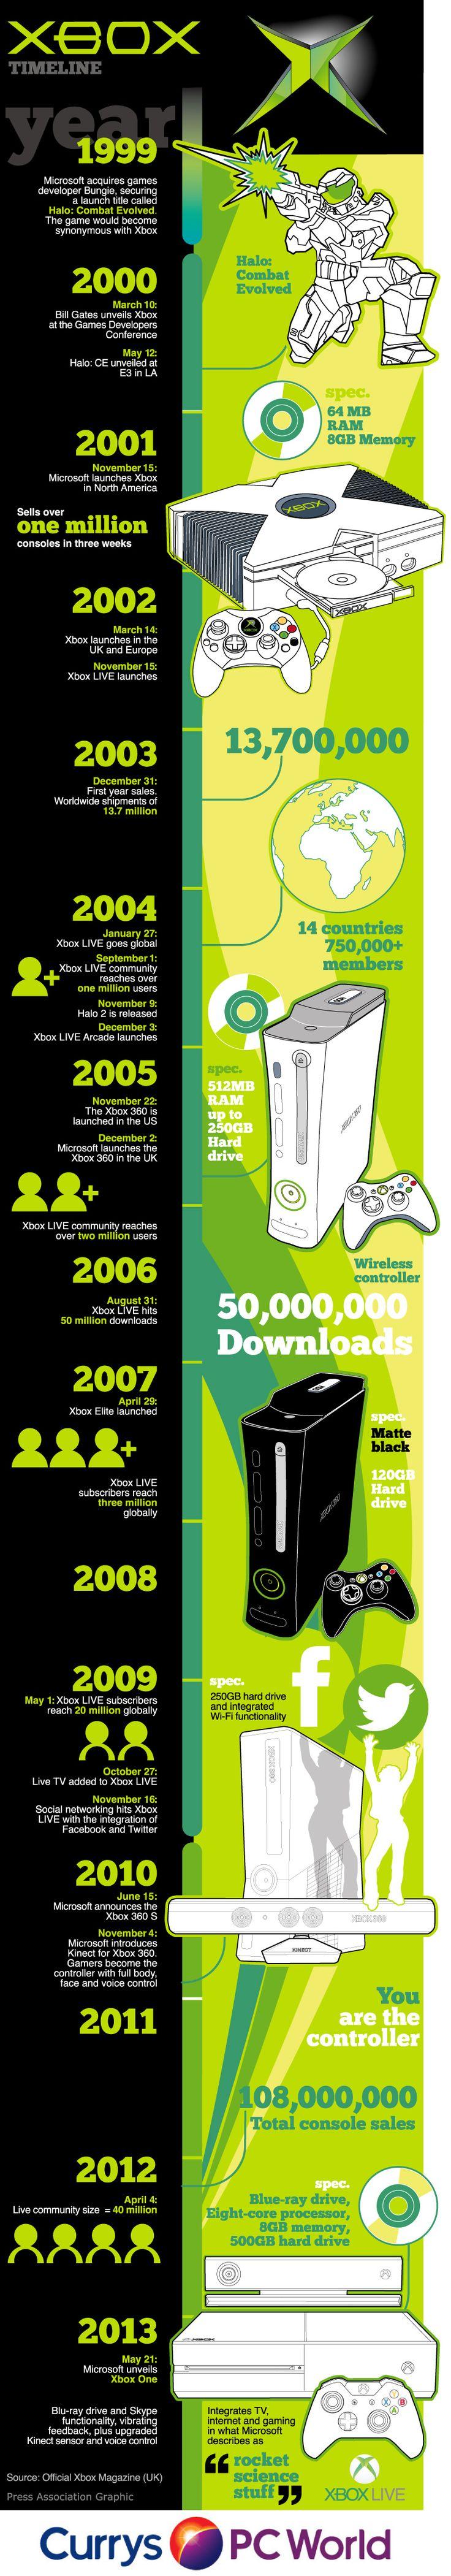 Timeline de xBox #infografia